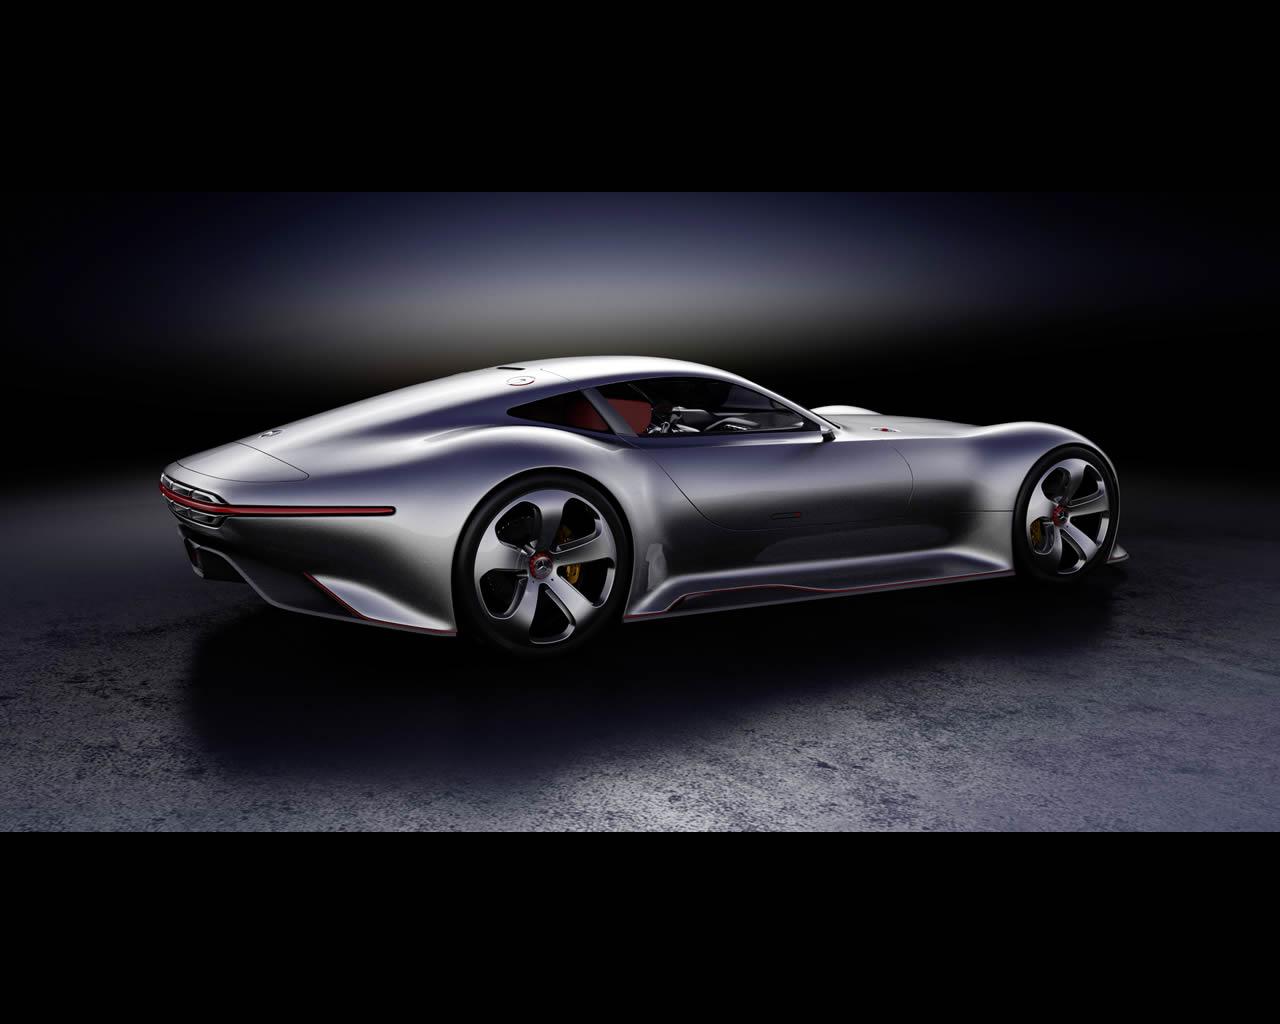 Charmant ... Mercedes Benz AMG Vision Gran Turismo